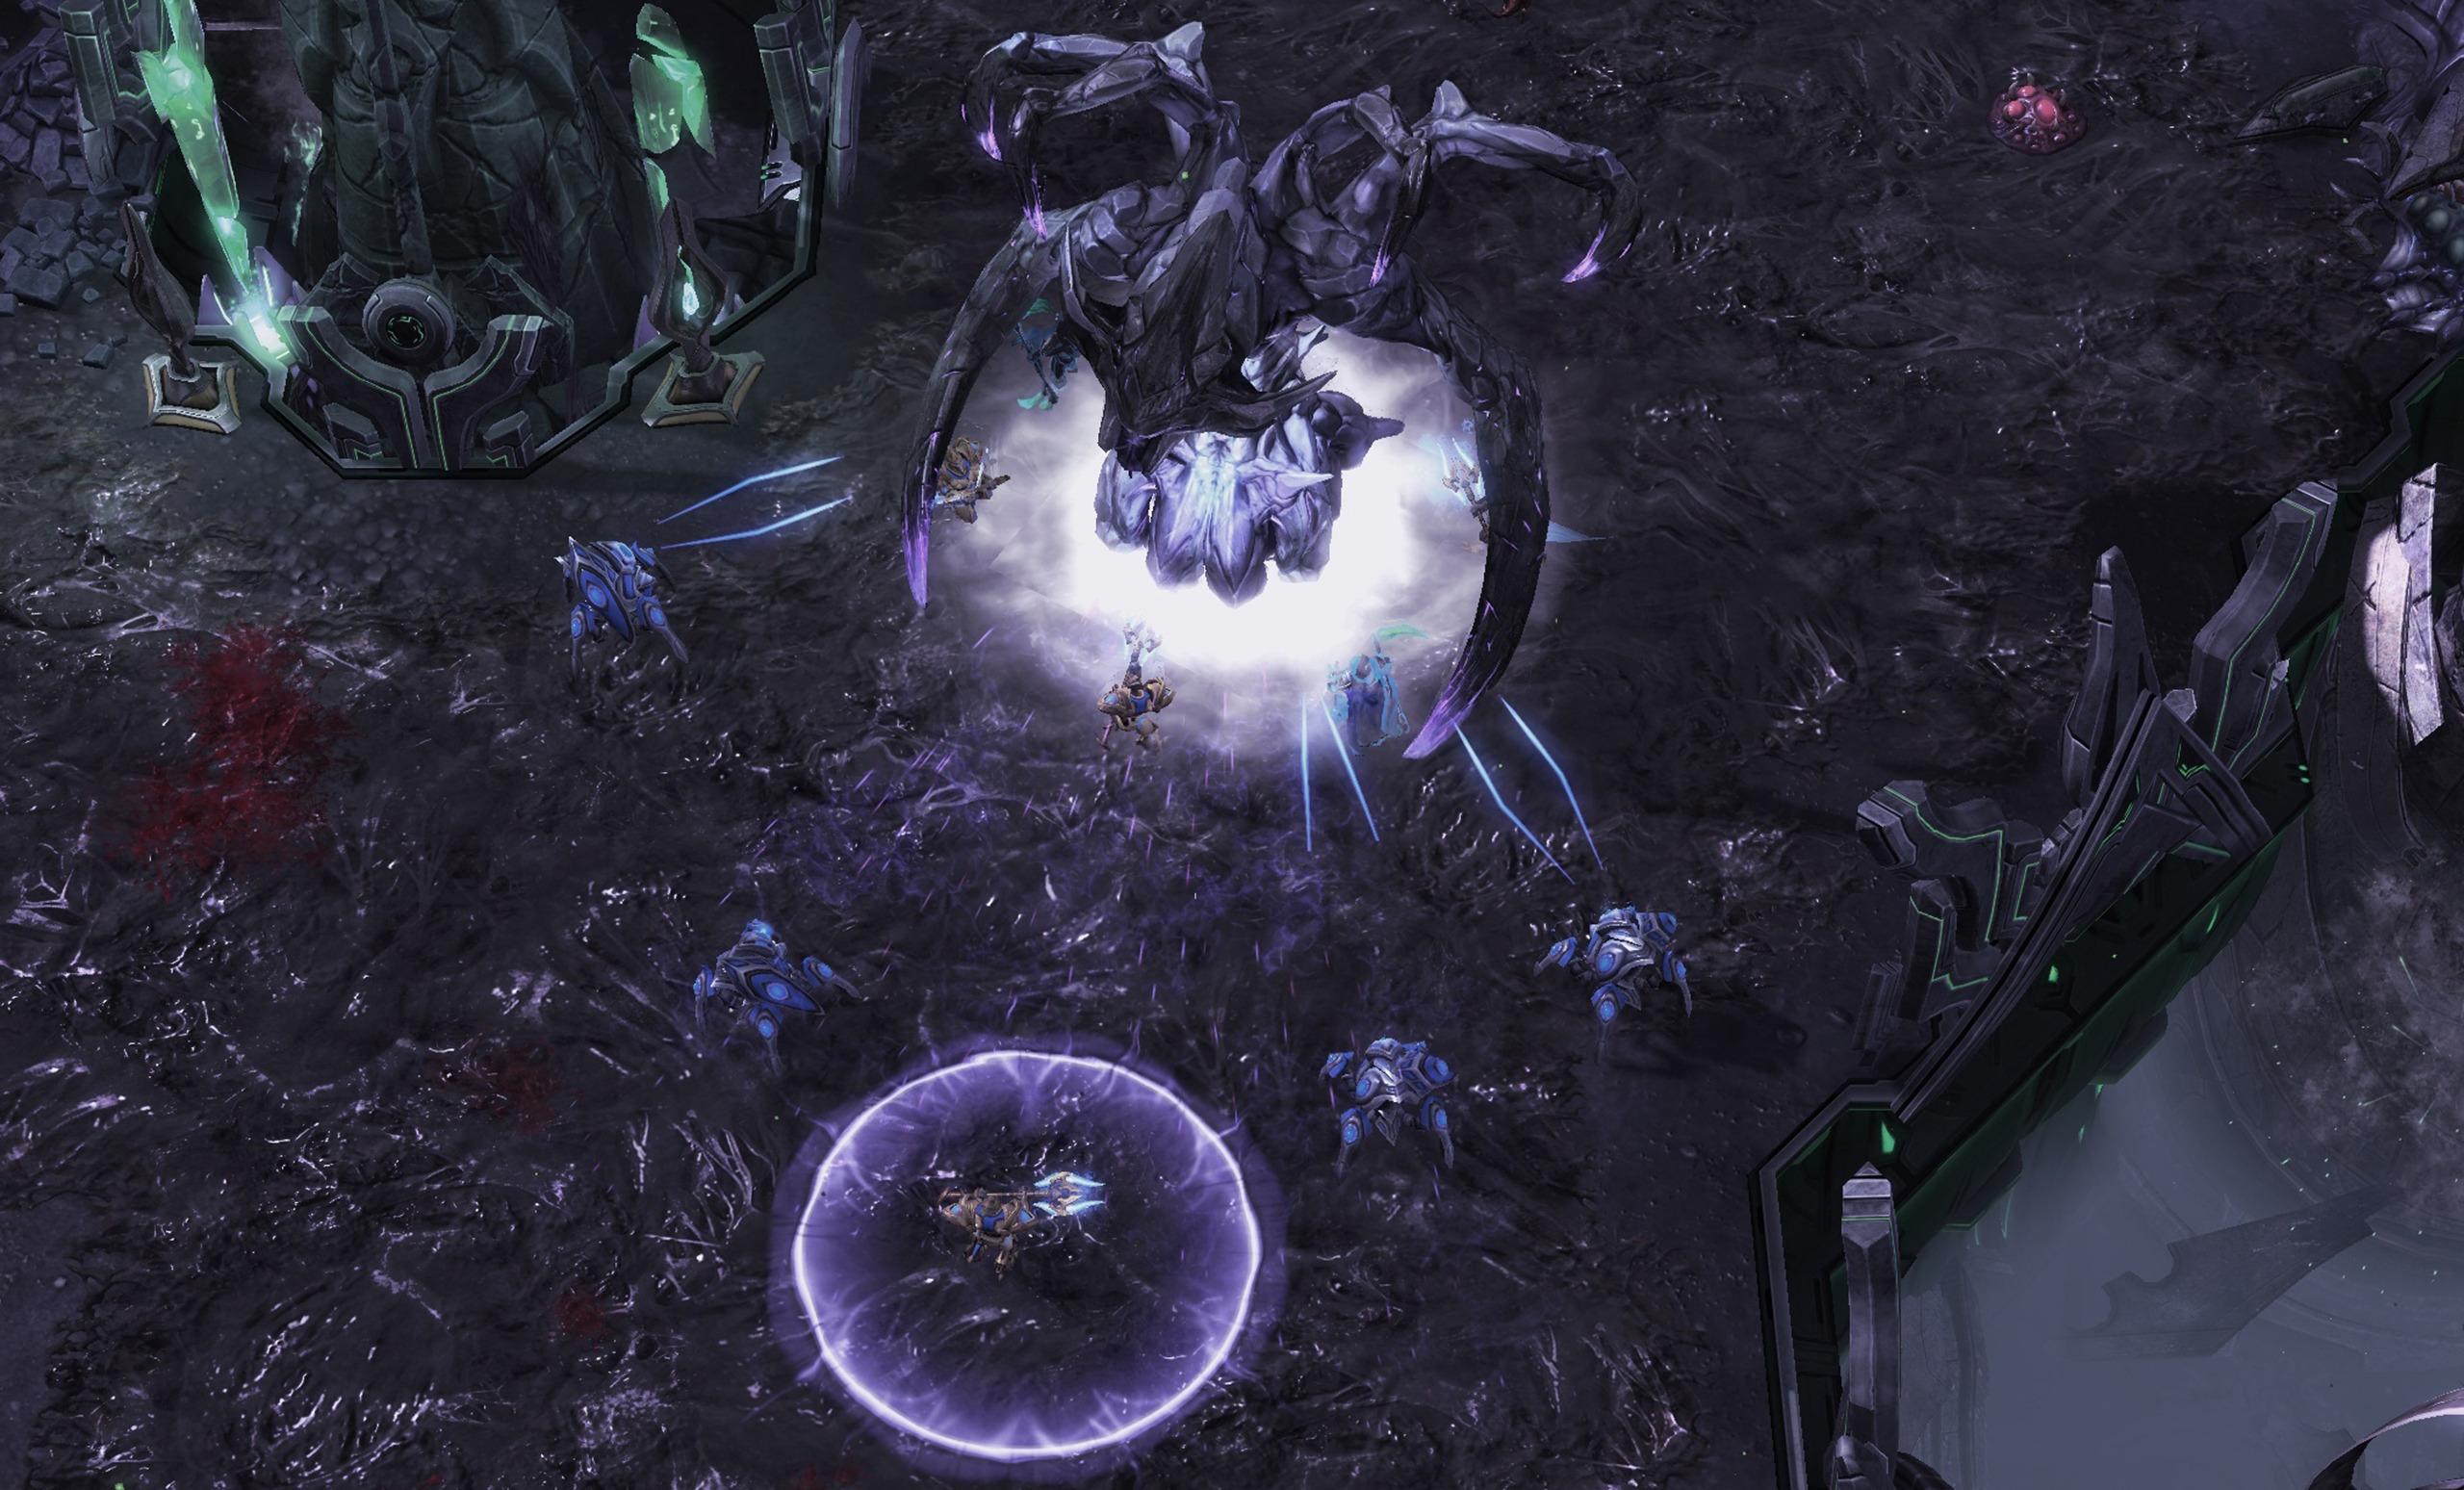 starcraft-ii-legacy-of-the-void-blizzcon-2014-shakuras-01-100529706-orig